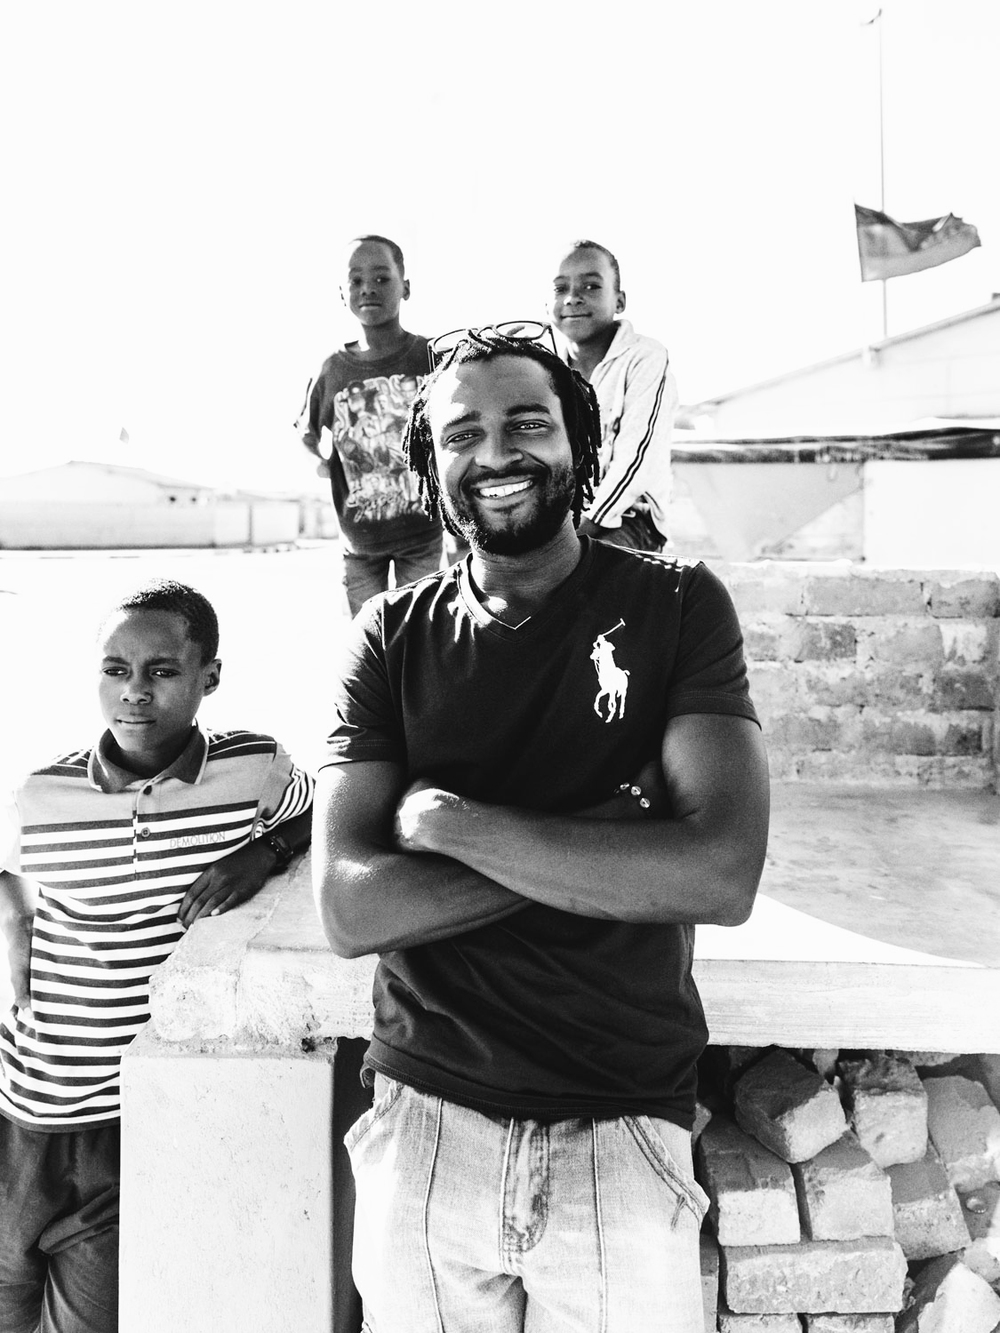 CallieGiovanna_Africa_Namibia_SwakopmundTownships_20150101_01090.jpg